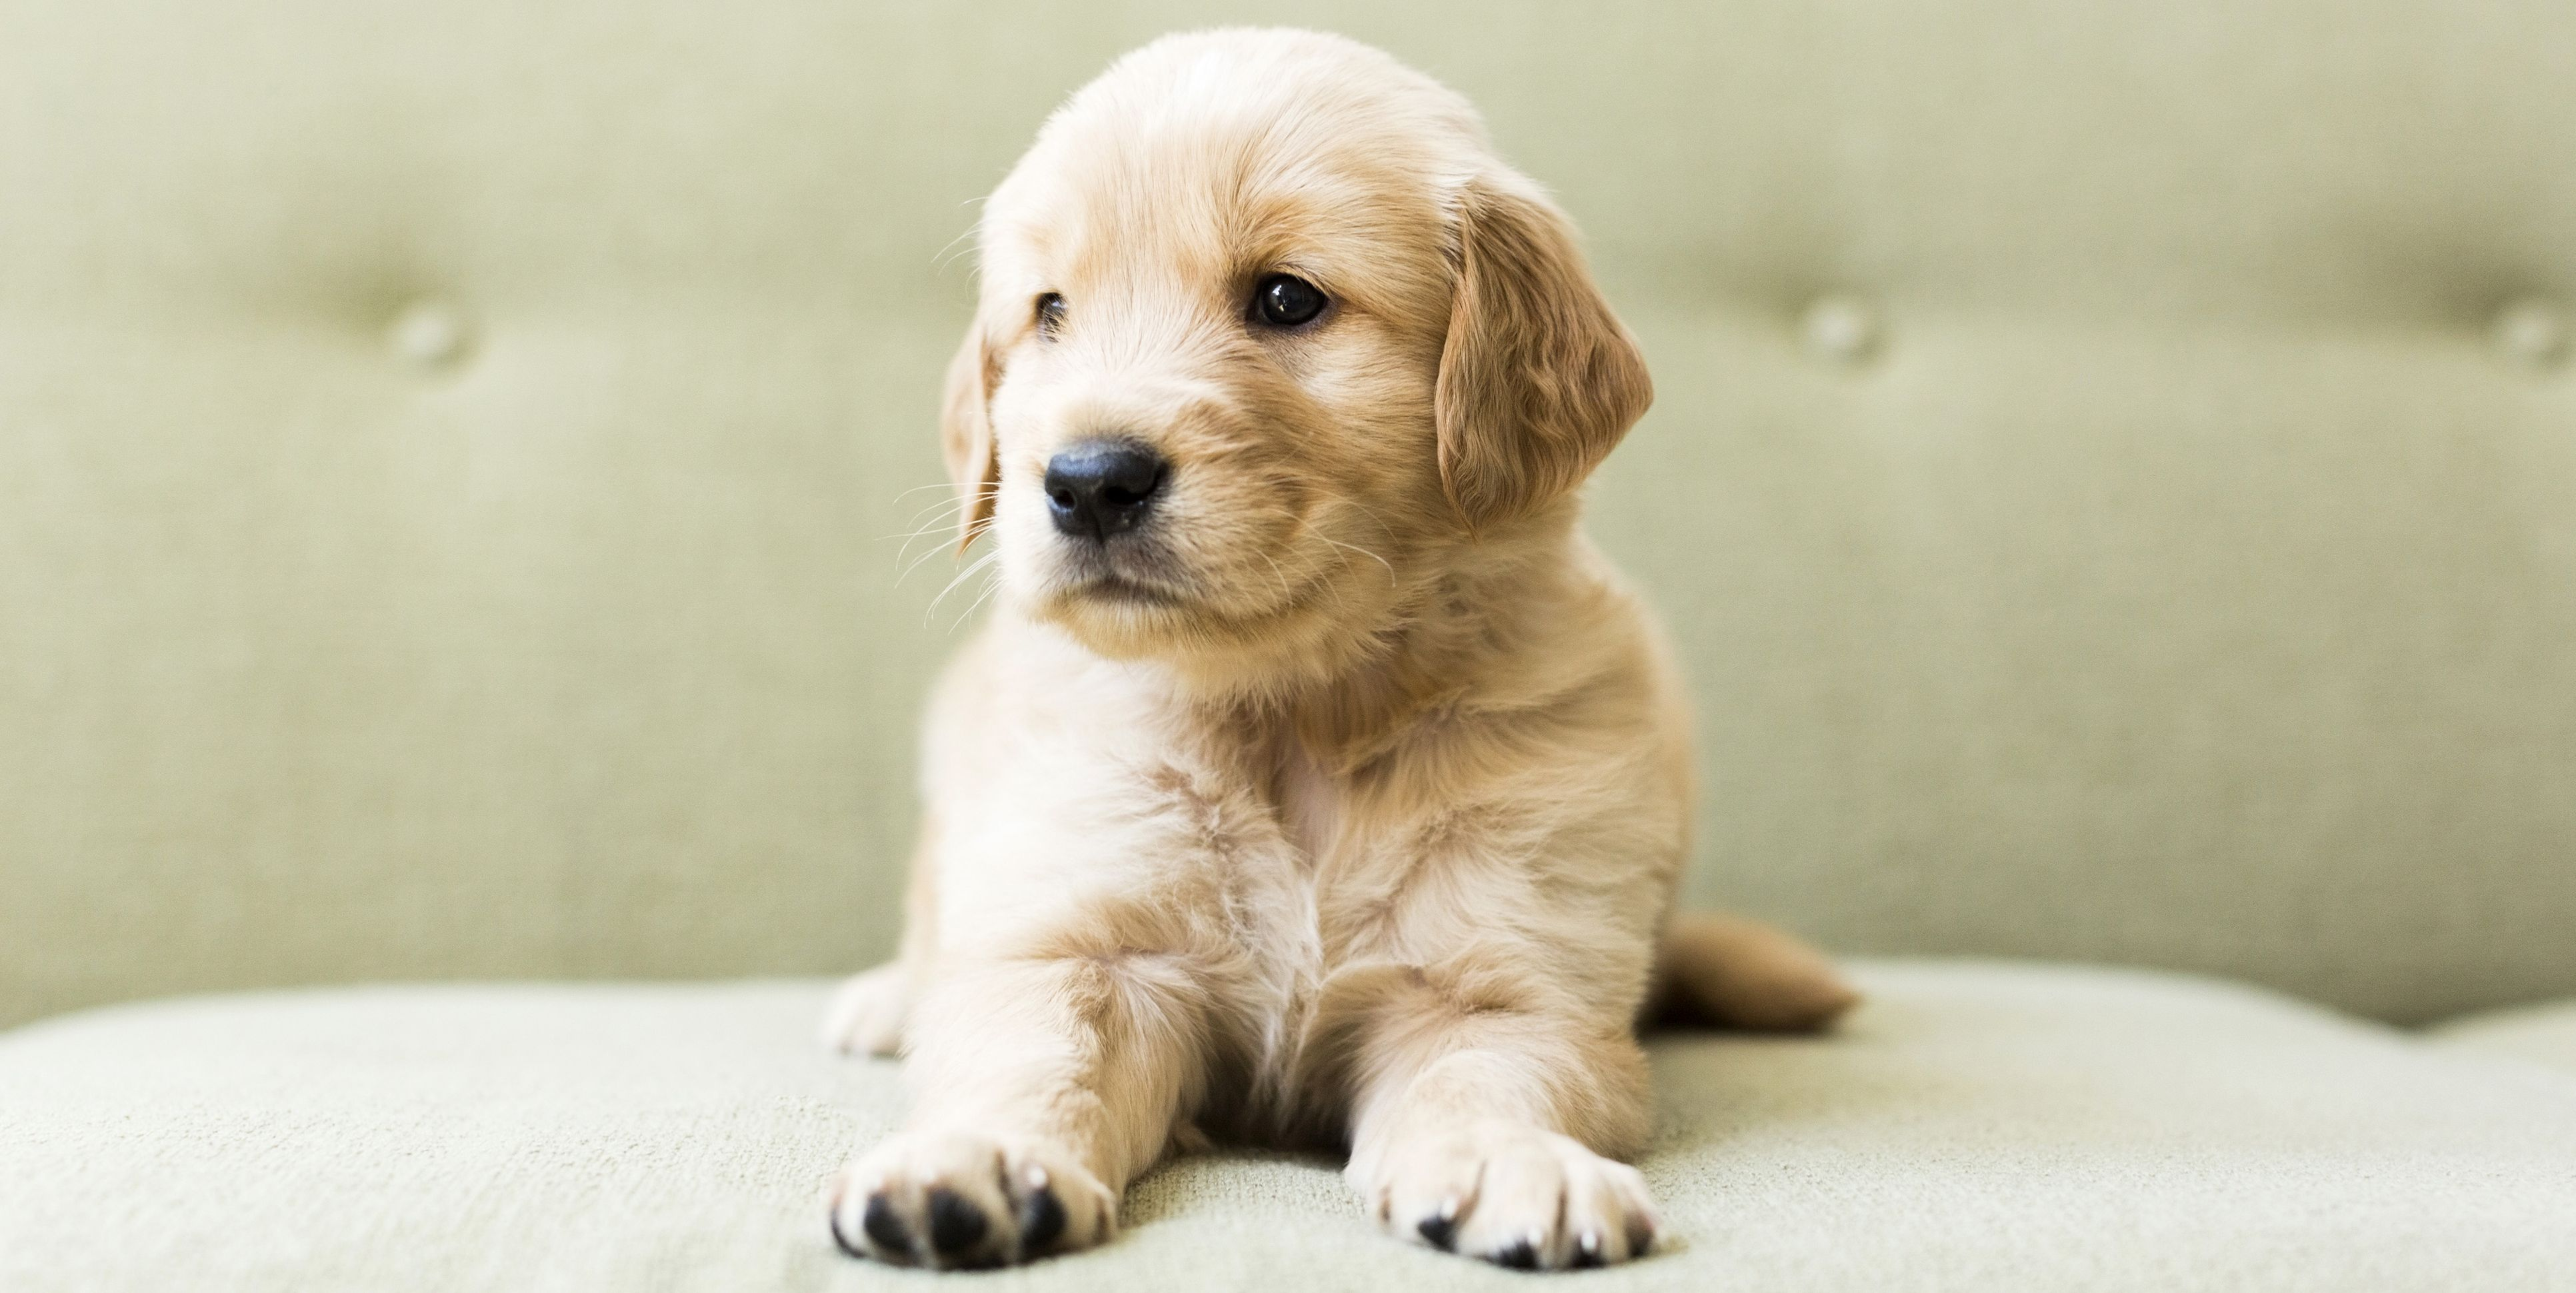 puppy-sofa